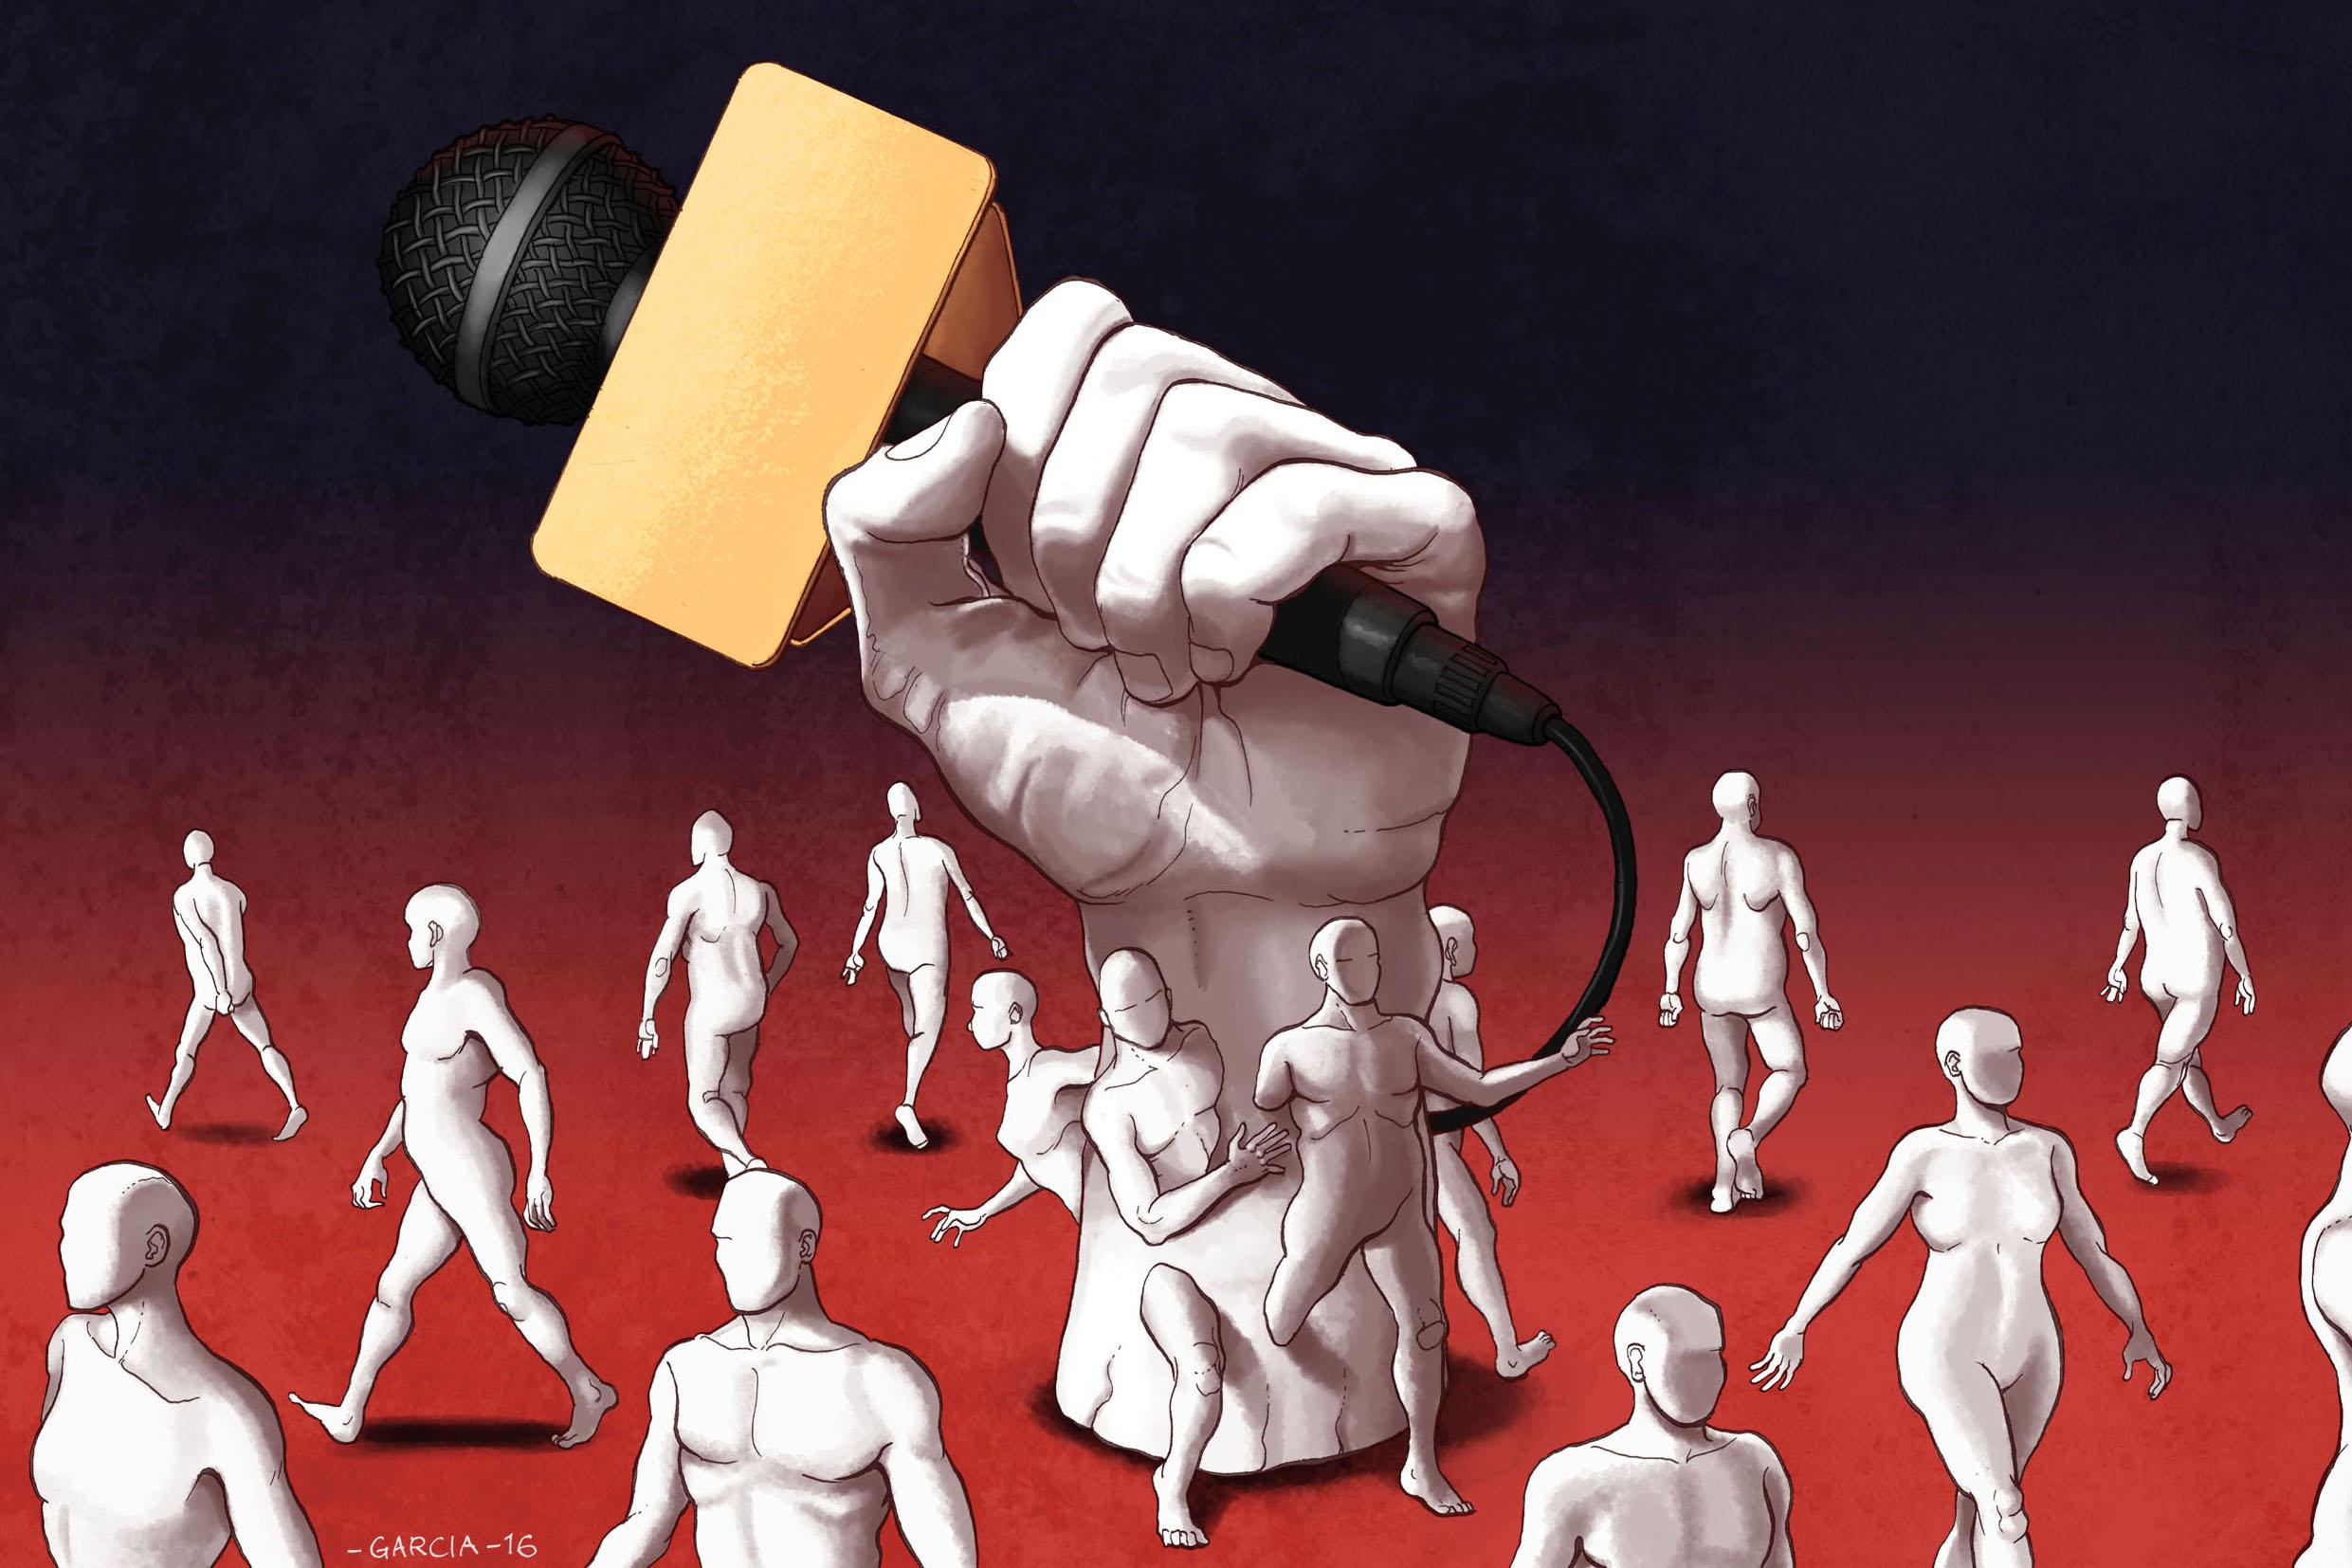 daniel-garcia-art-illustration-press-journalists-unions-hand-people-polska-dziennikarze-1